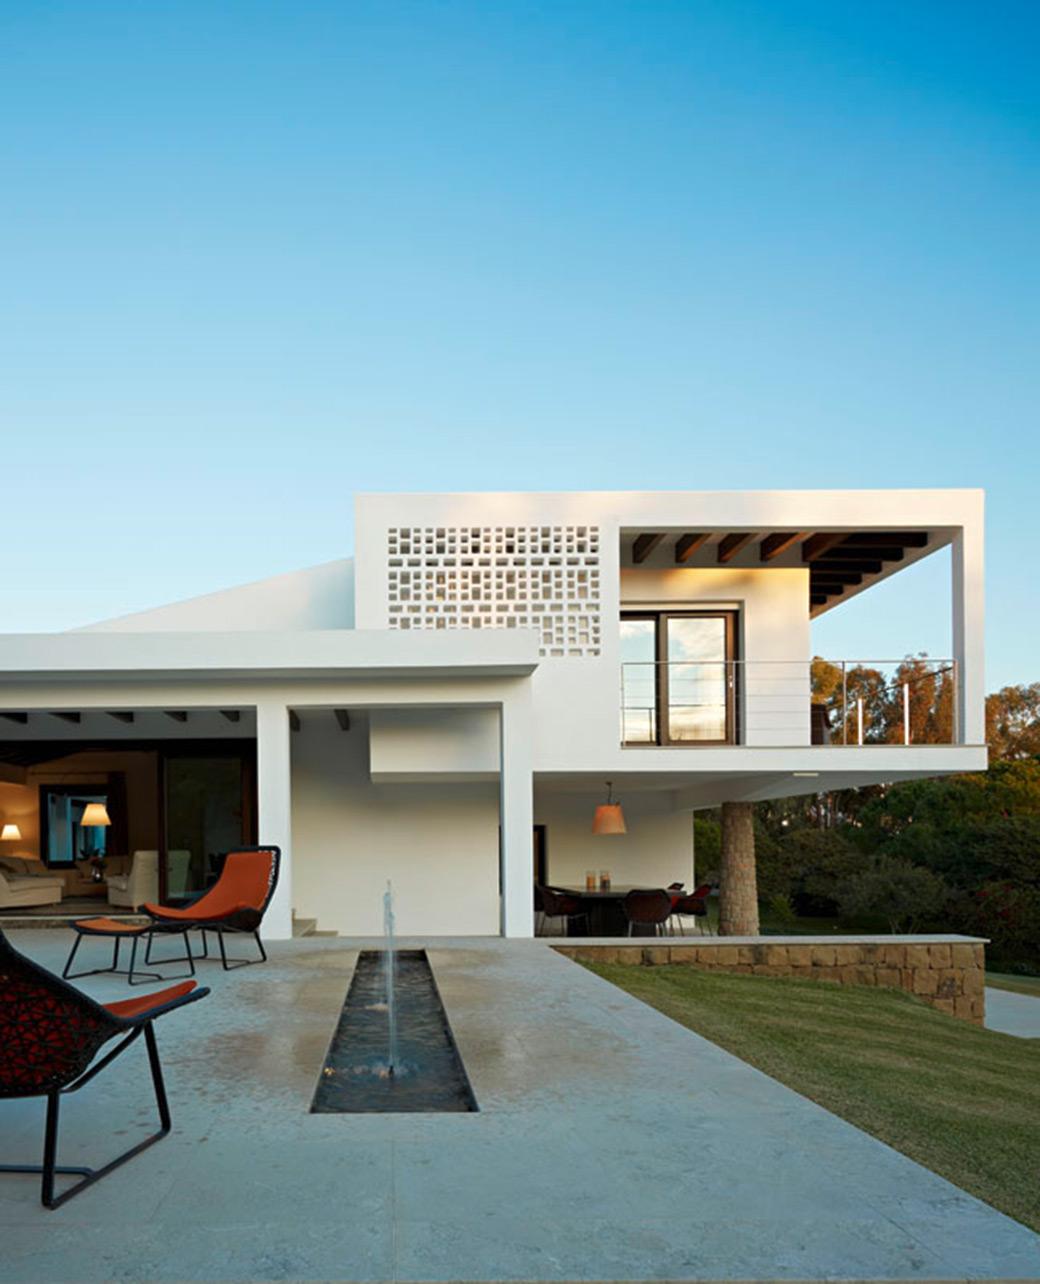 Alejandro-gimenez-architects-las-chapas-01